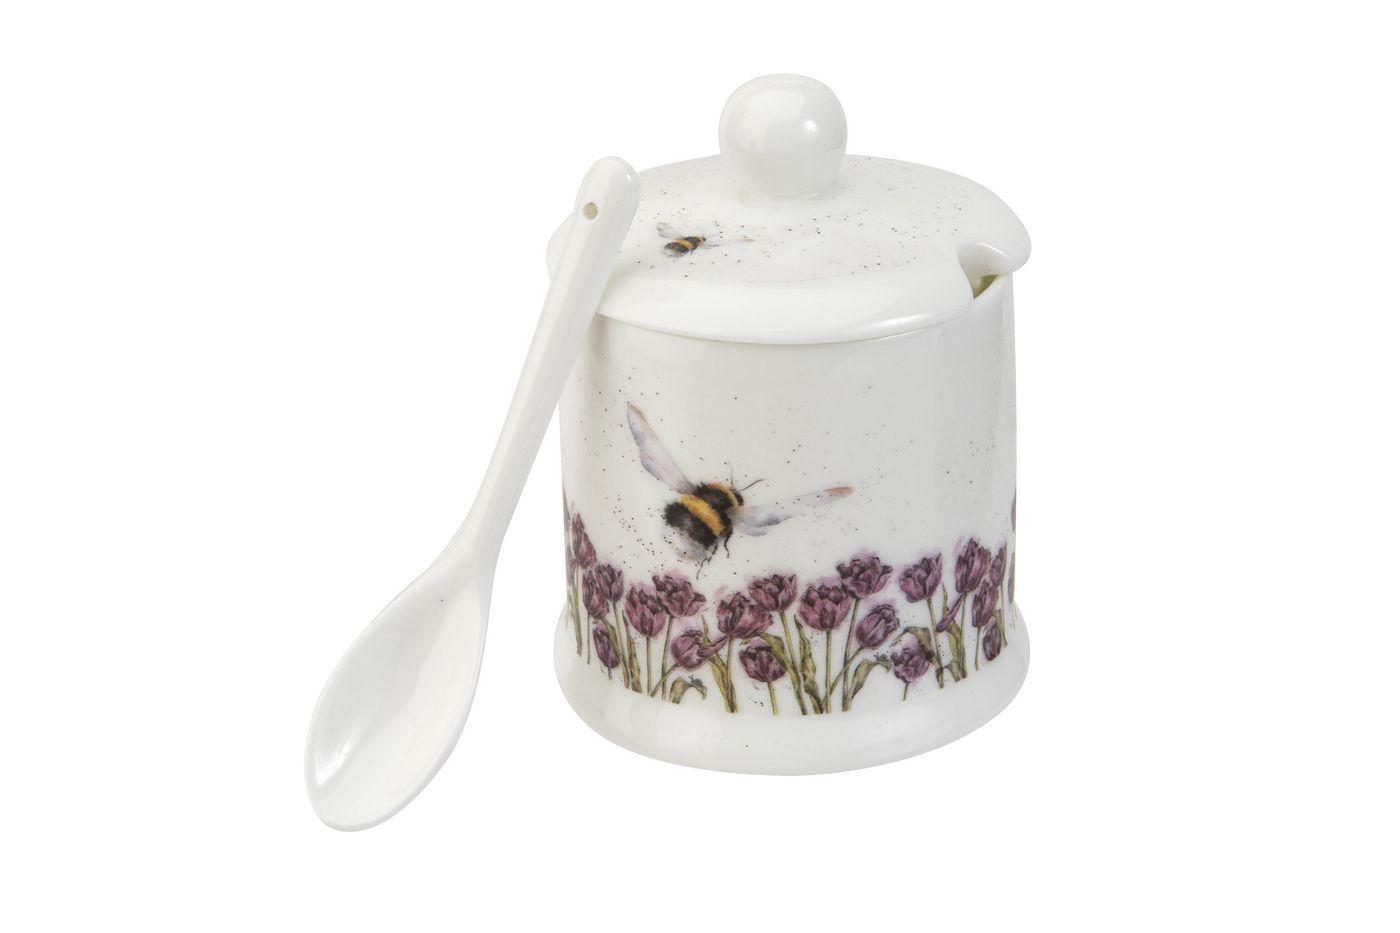 Royal Worcester Wrendale Designs Jam Pot + Lid Bumble Bee 0.11l thumb 2